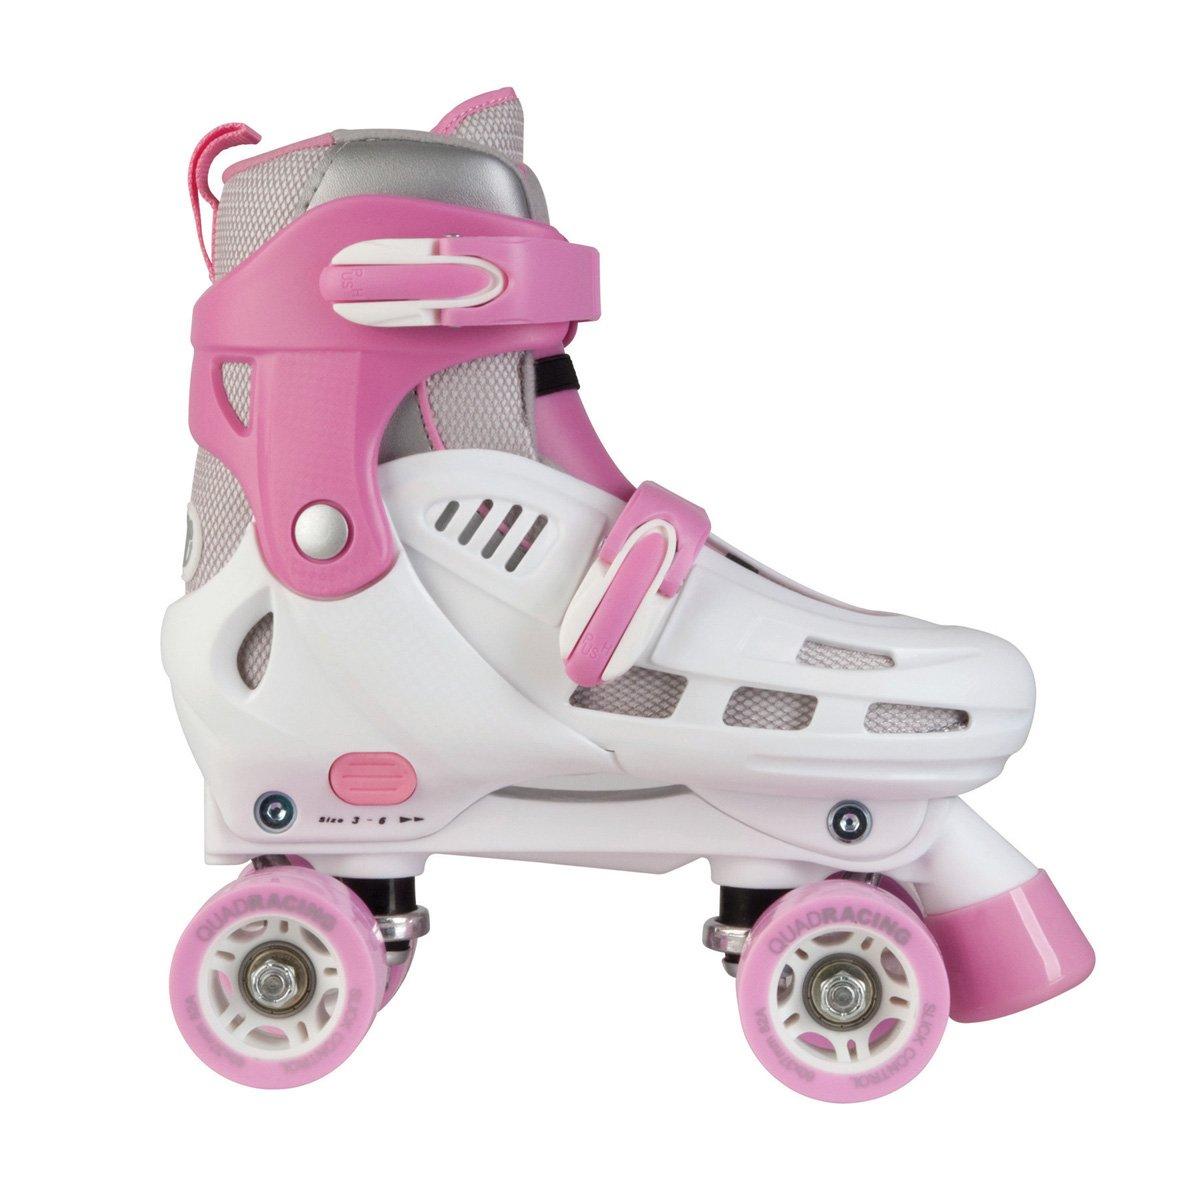 SFR Storm Roller Skates White//Pink